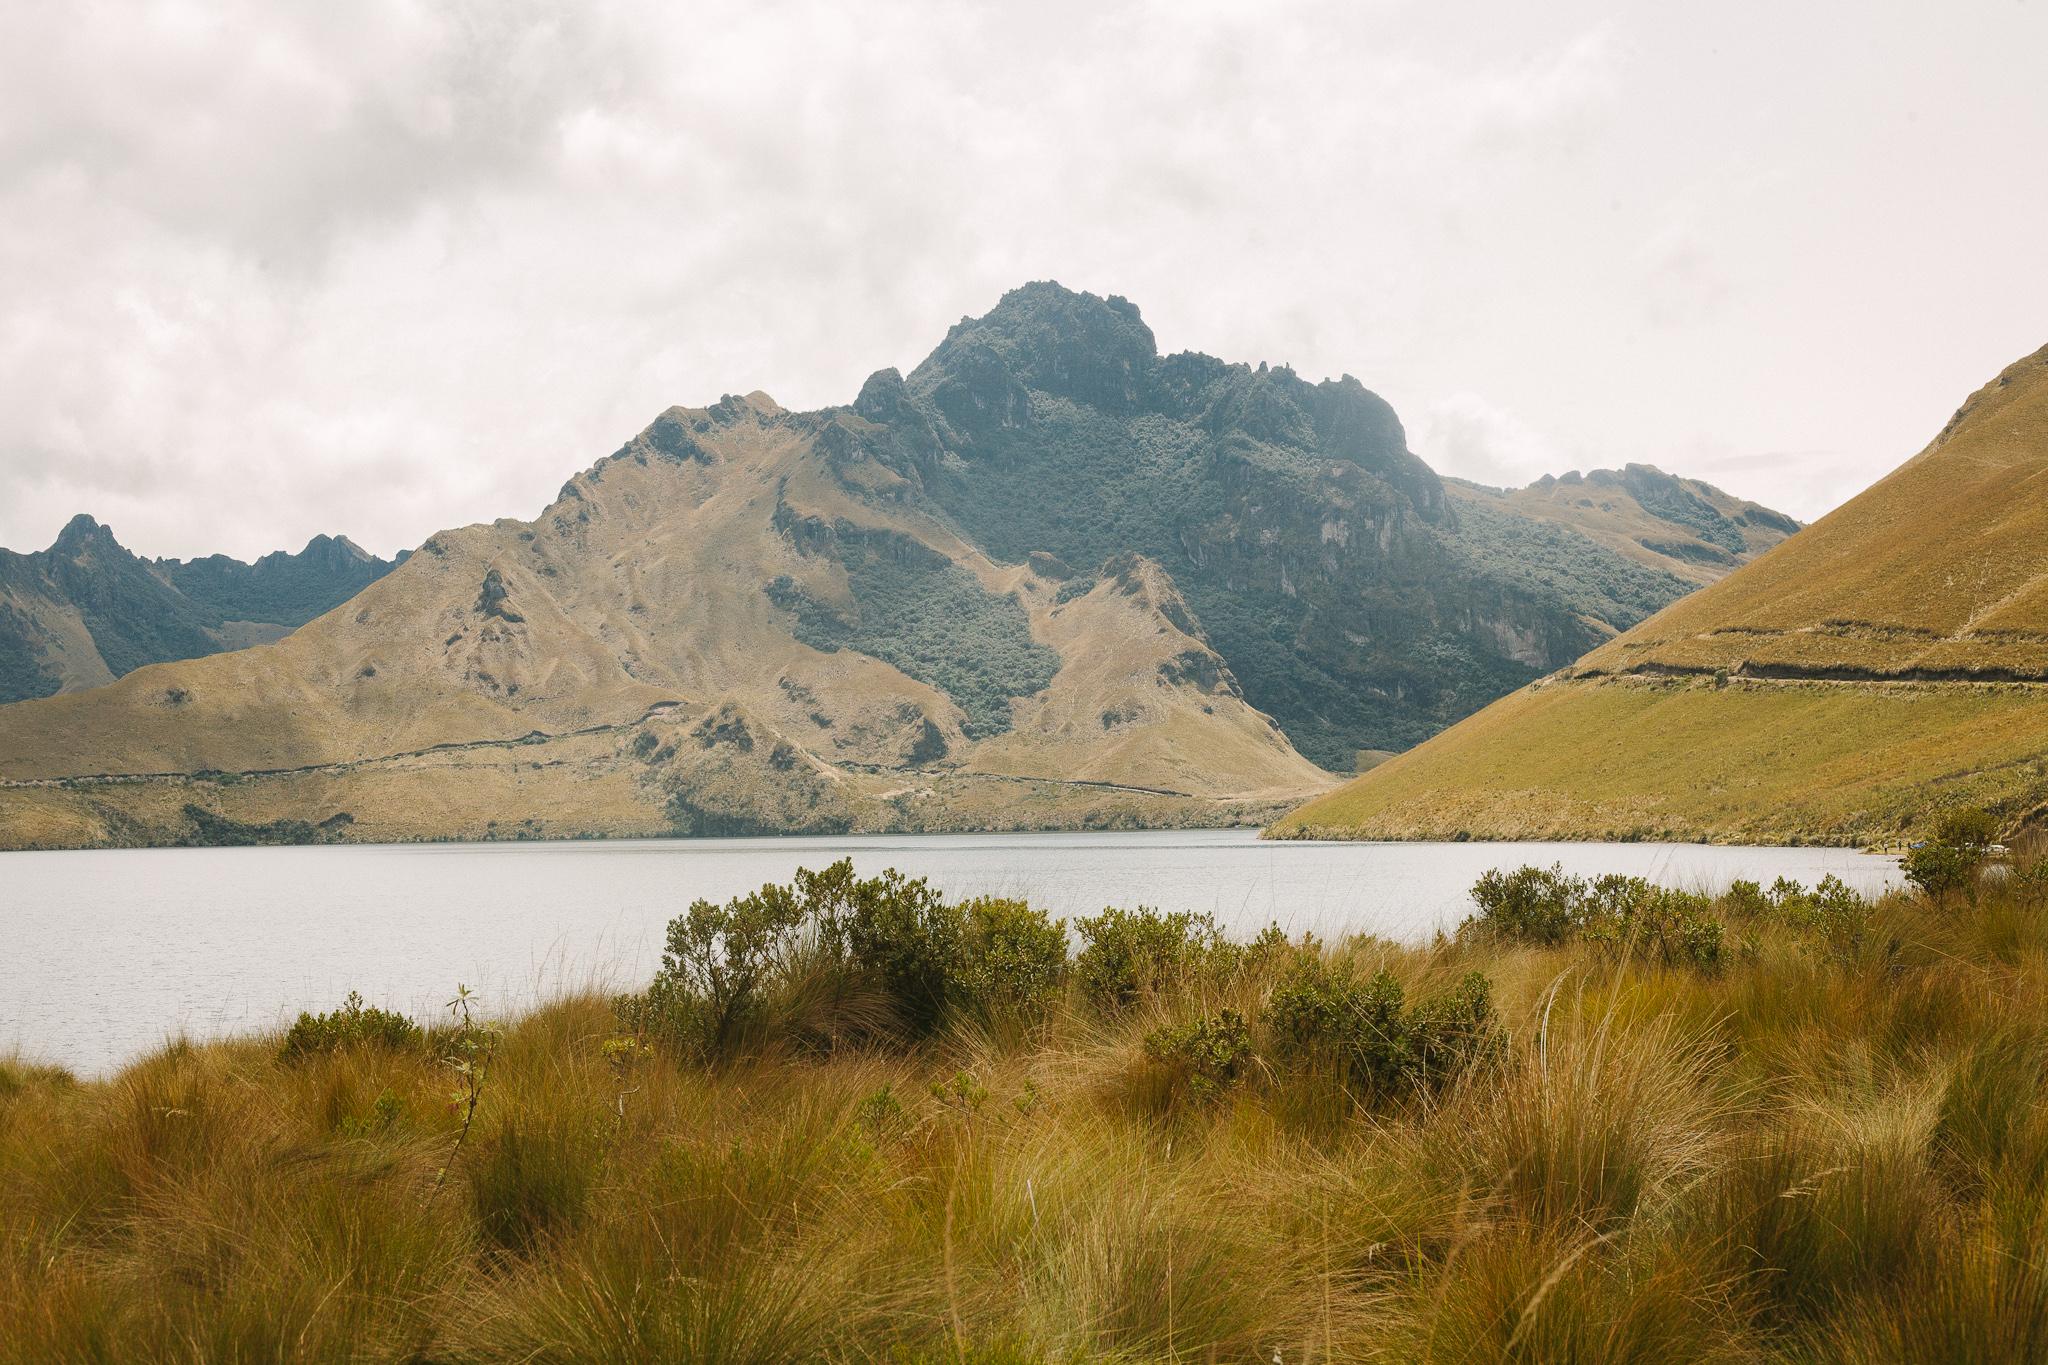 Ecuador2011_Mountains&Sea_Web_jenniferleahy-061.jpg